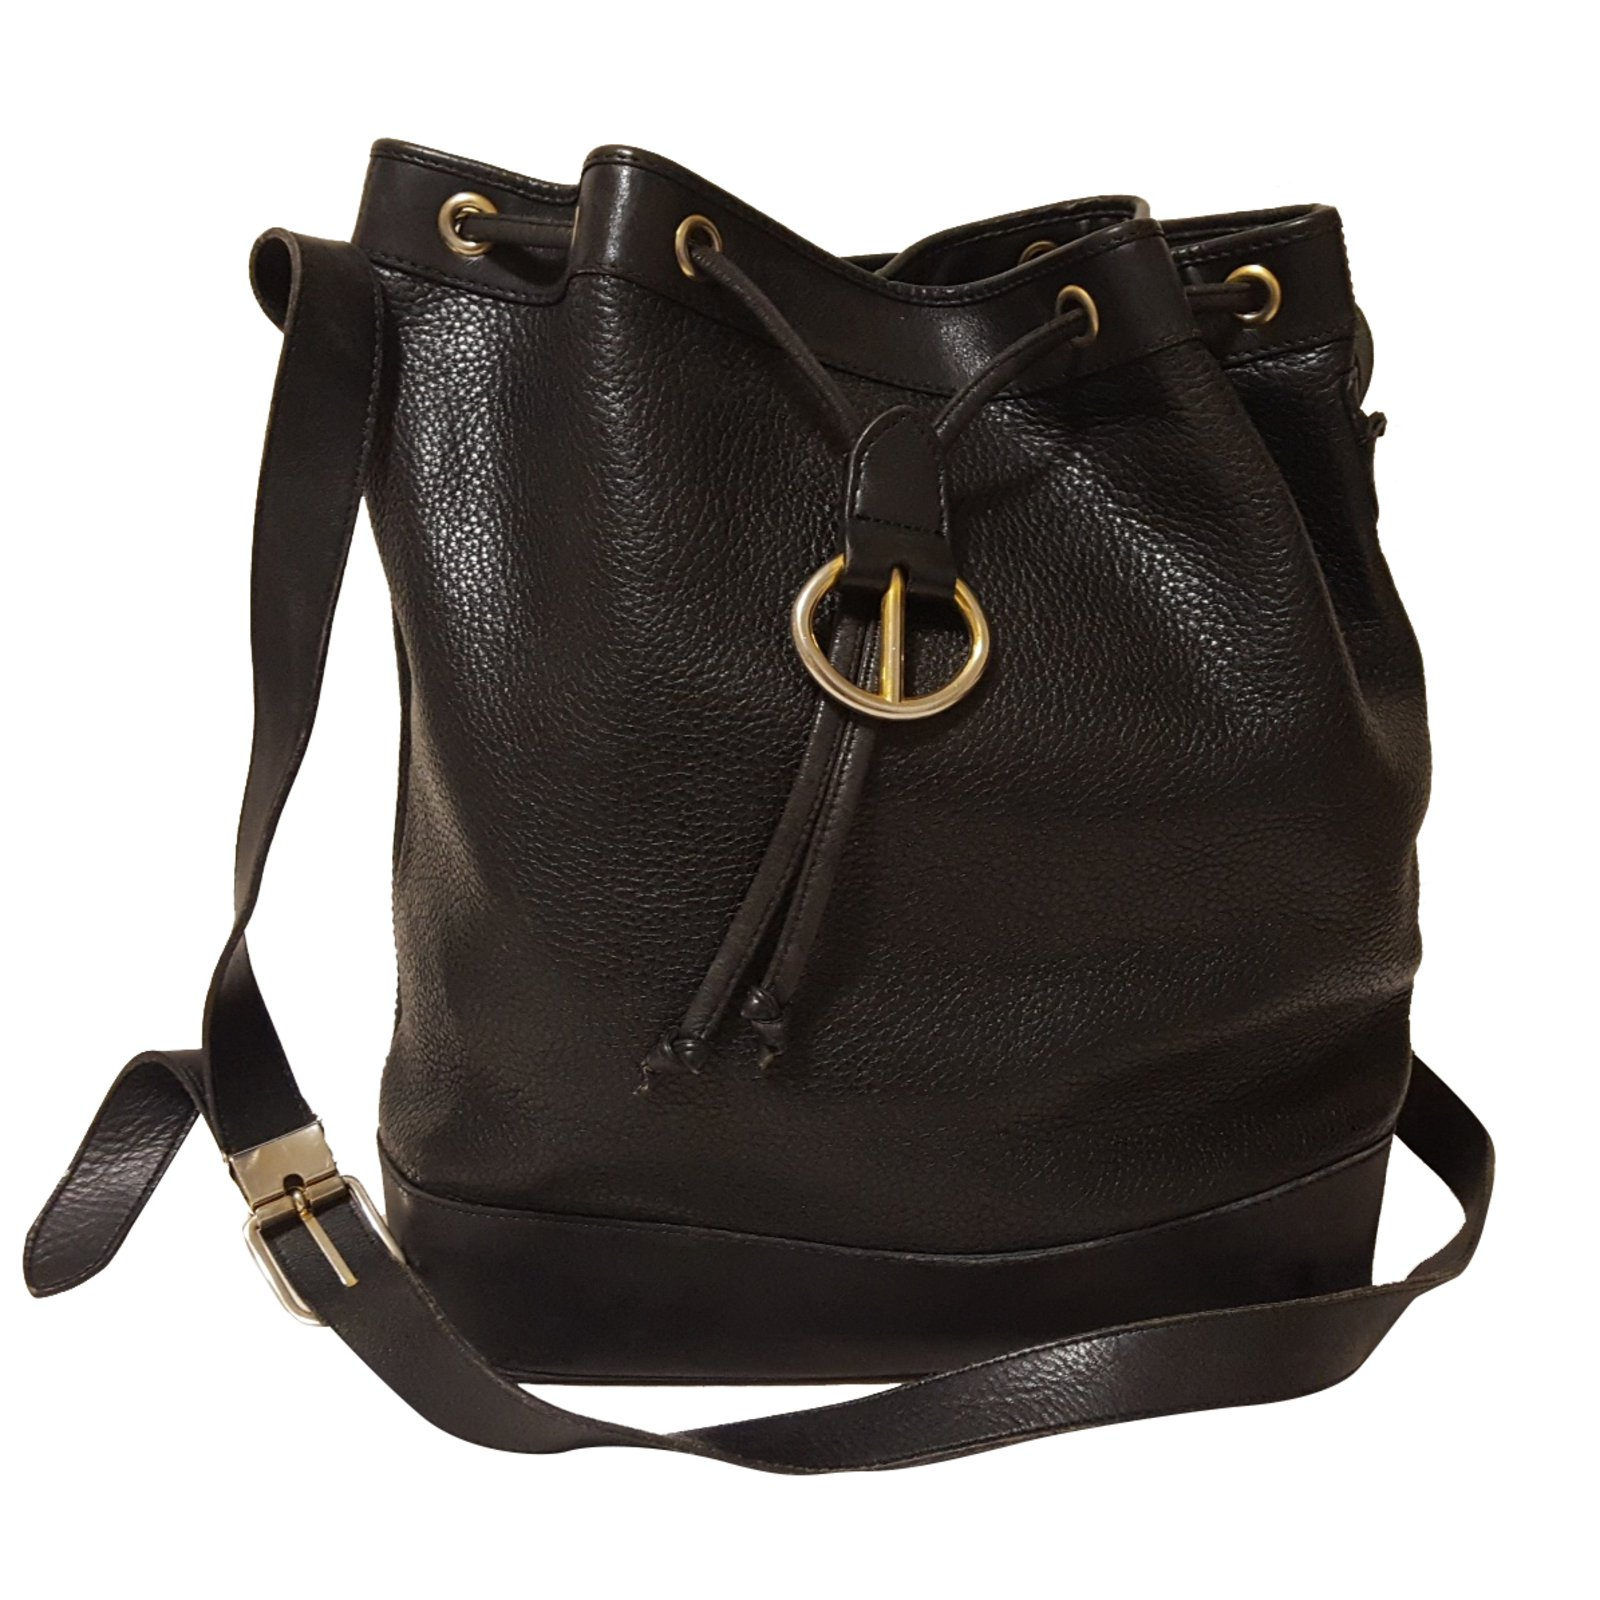 sacs main dior sac seau cuir noir joli closet. Black Bedroom Furniture Sets. Home Design Ideas